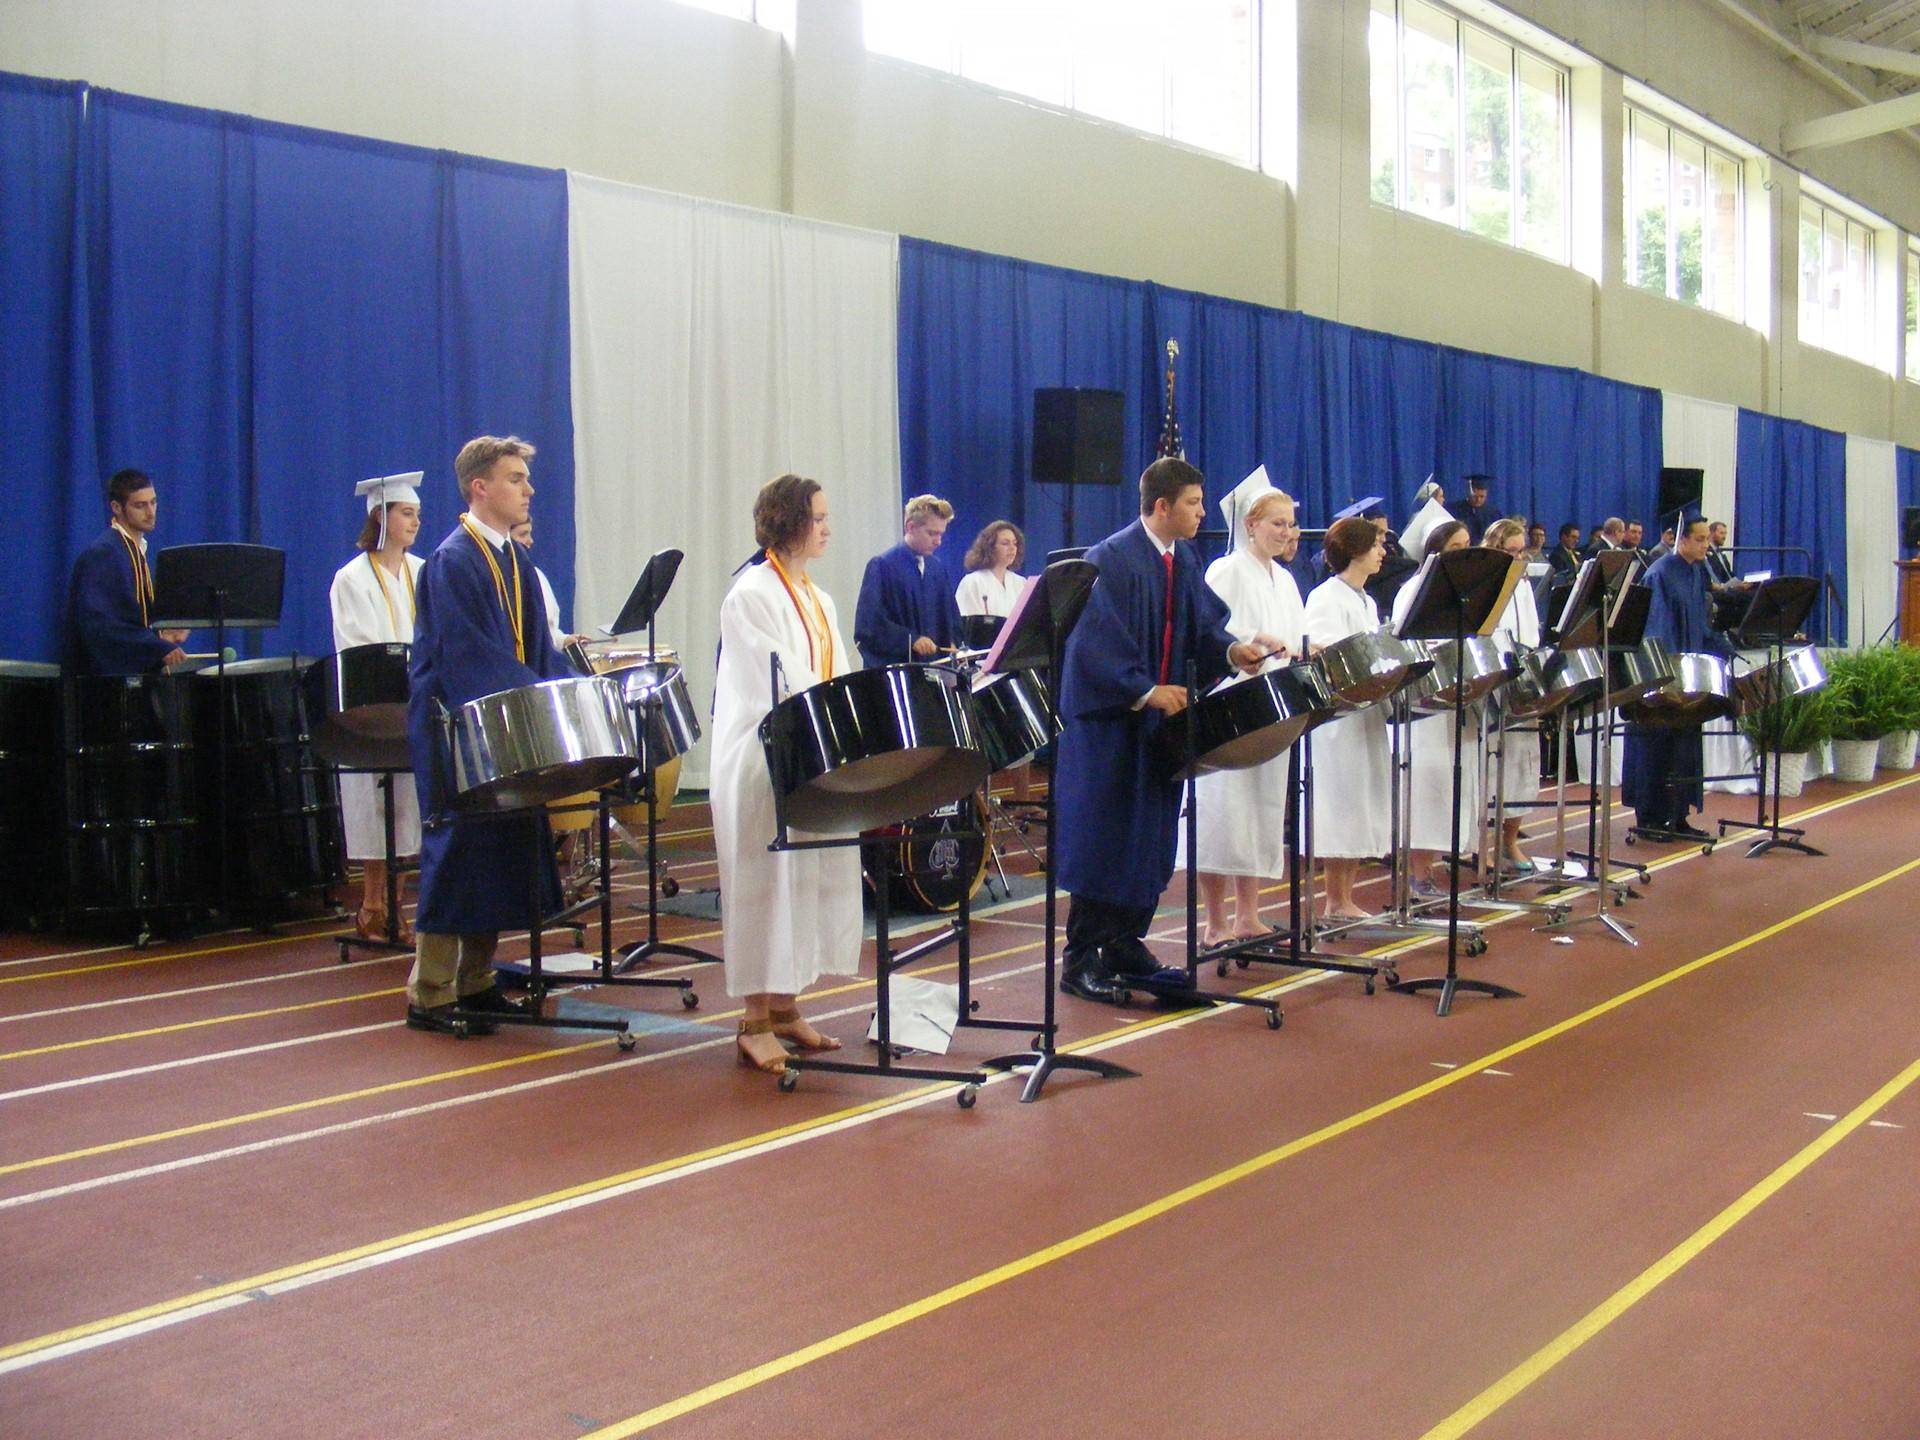 Senior Blue Steel Performs